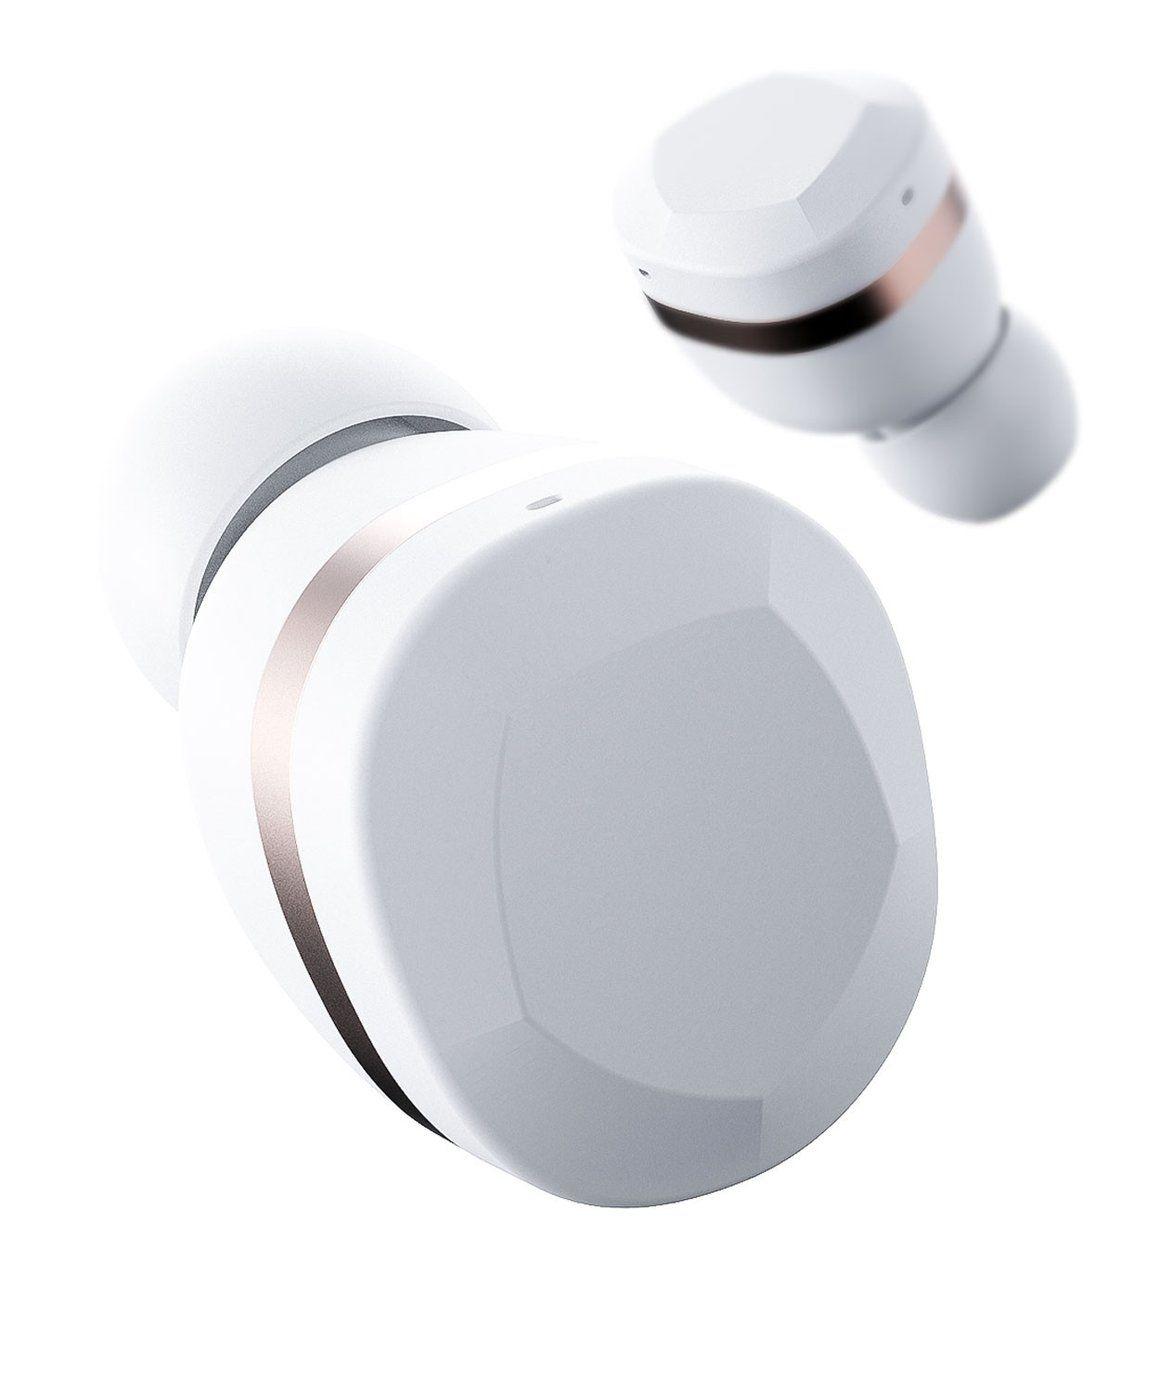 6ae9e014968 YEVO 1 in Ivory White, the future of Headphones. A true wireless headphone  designed in Sweden. | YEVO Labs | Wireless headphones, Innovation lab,  Headphones